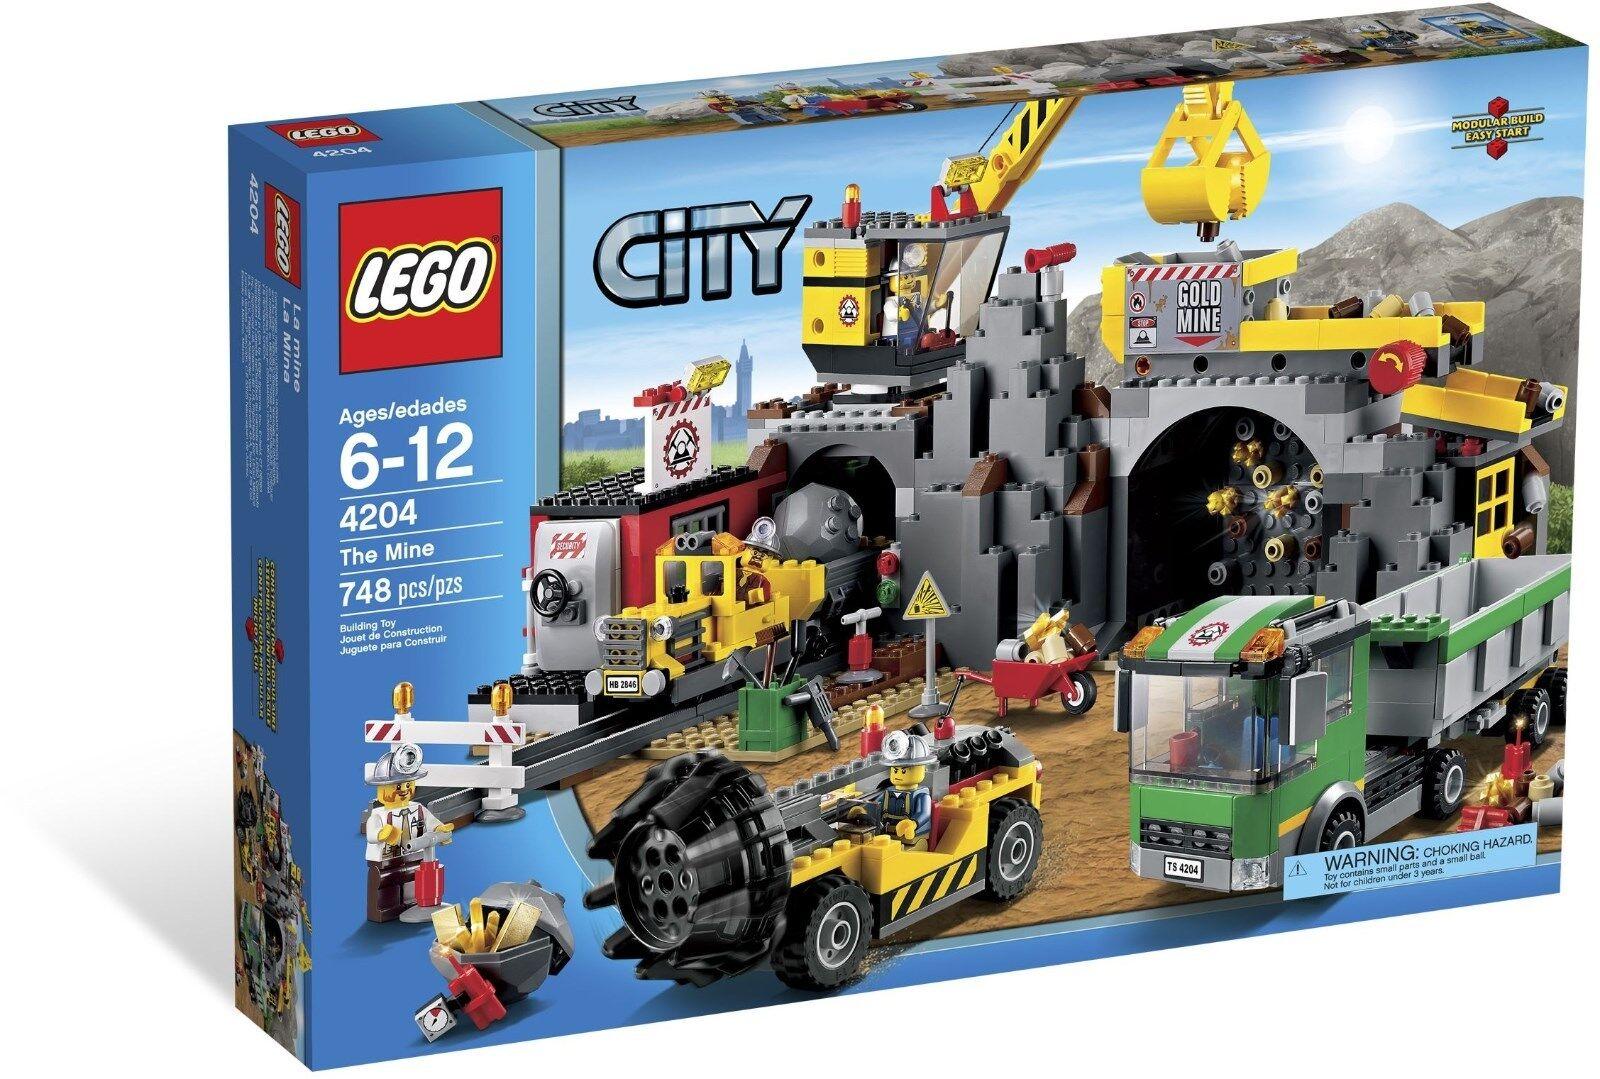 NEW LEGO 4204 CITY The Mine FACTORY SEALED SET RETIROT